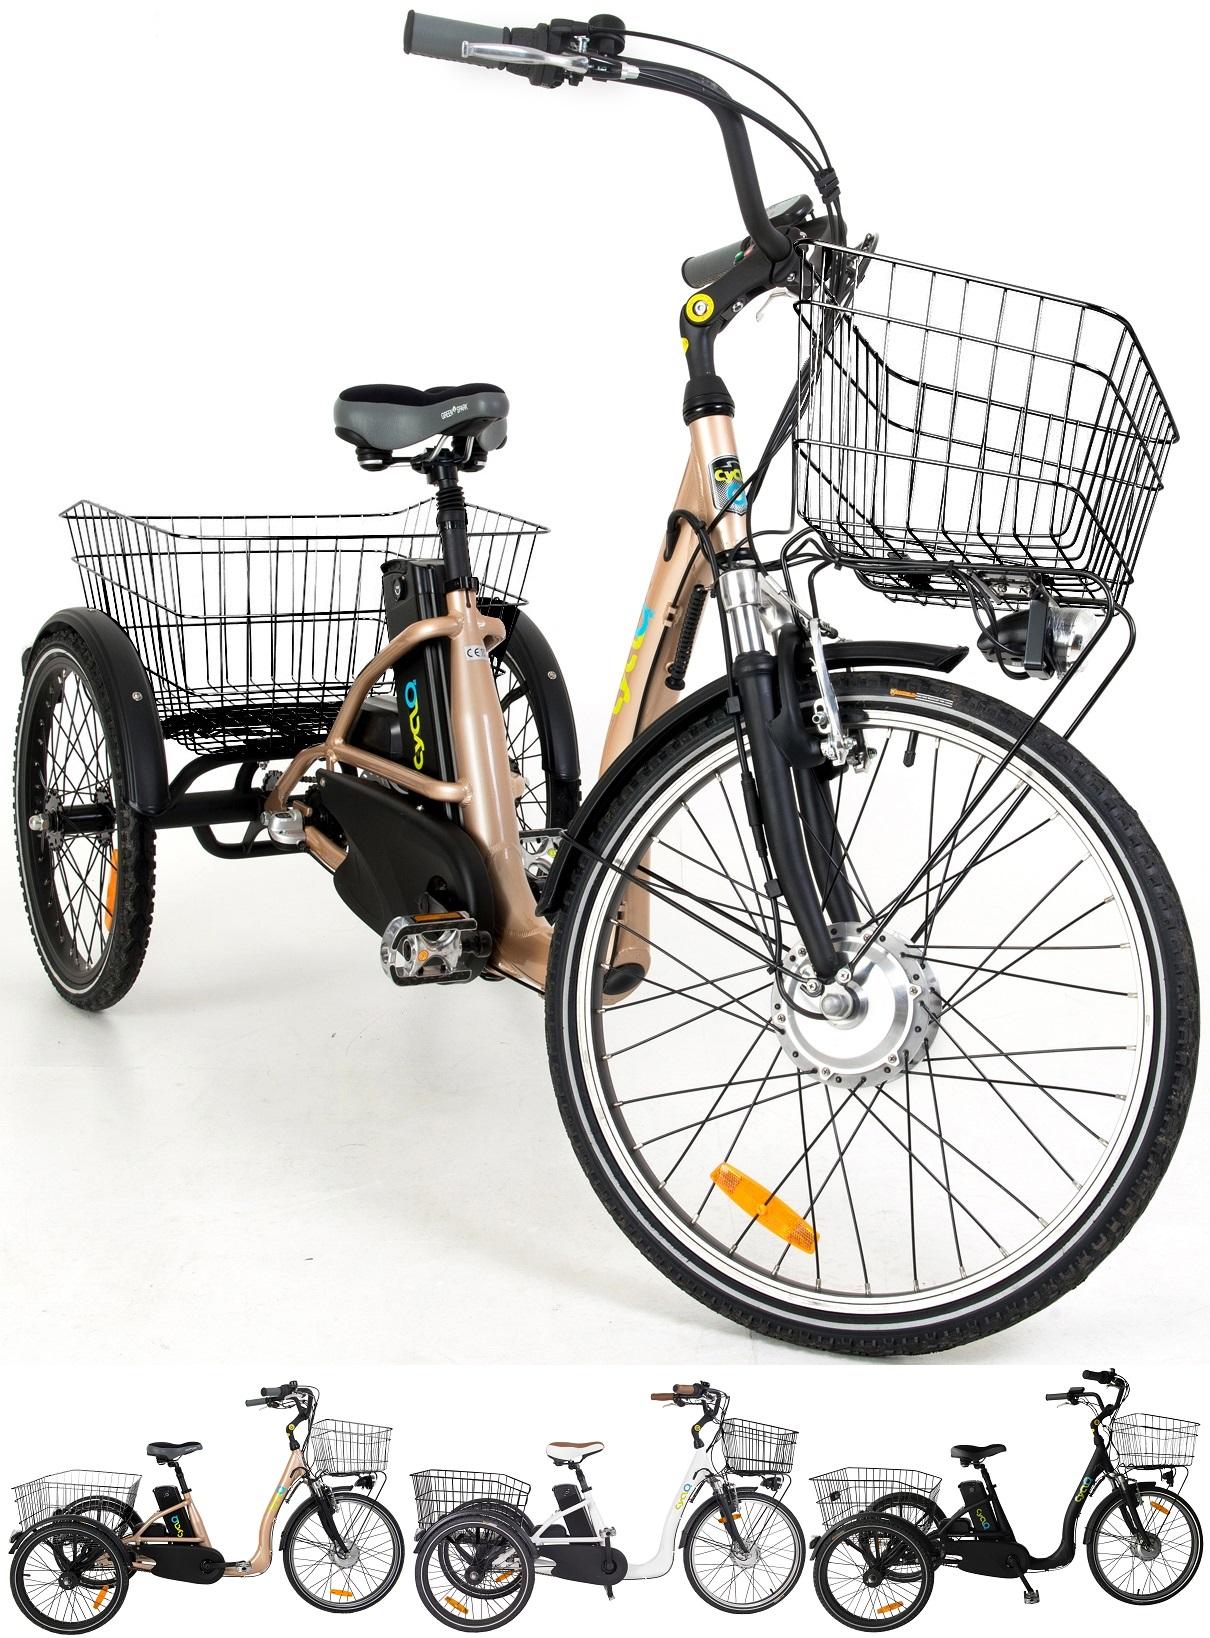 24 zoll elektro dreirad 3 gang cyclo2 comfort24 fahrr der. Black Bedroom Furniture Sets. Home Design Ideas